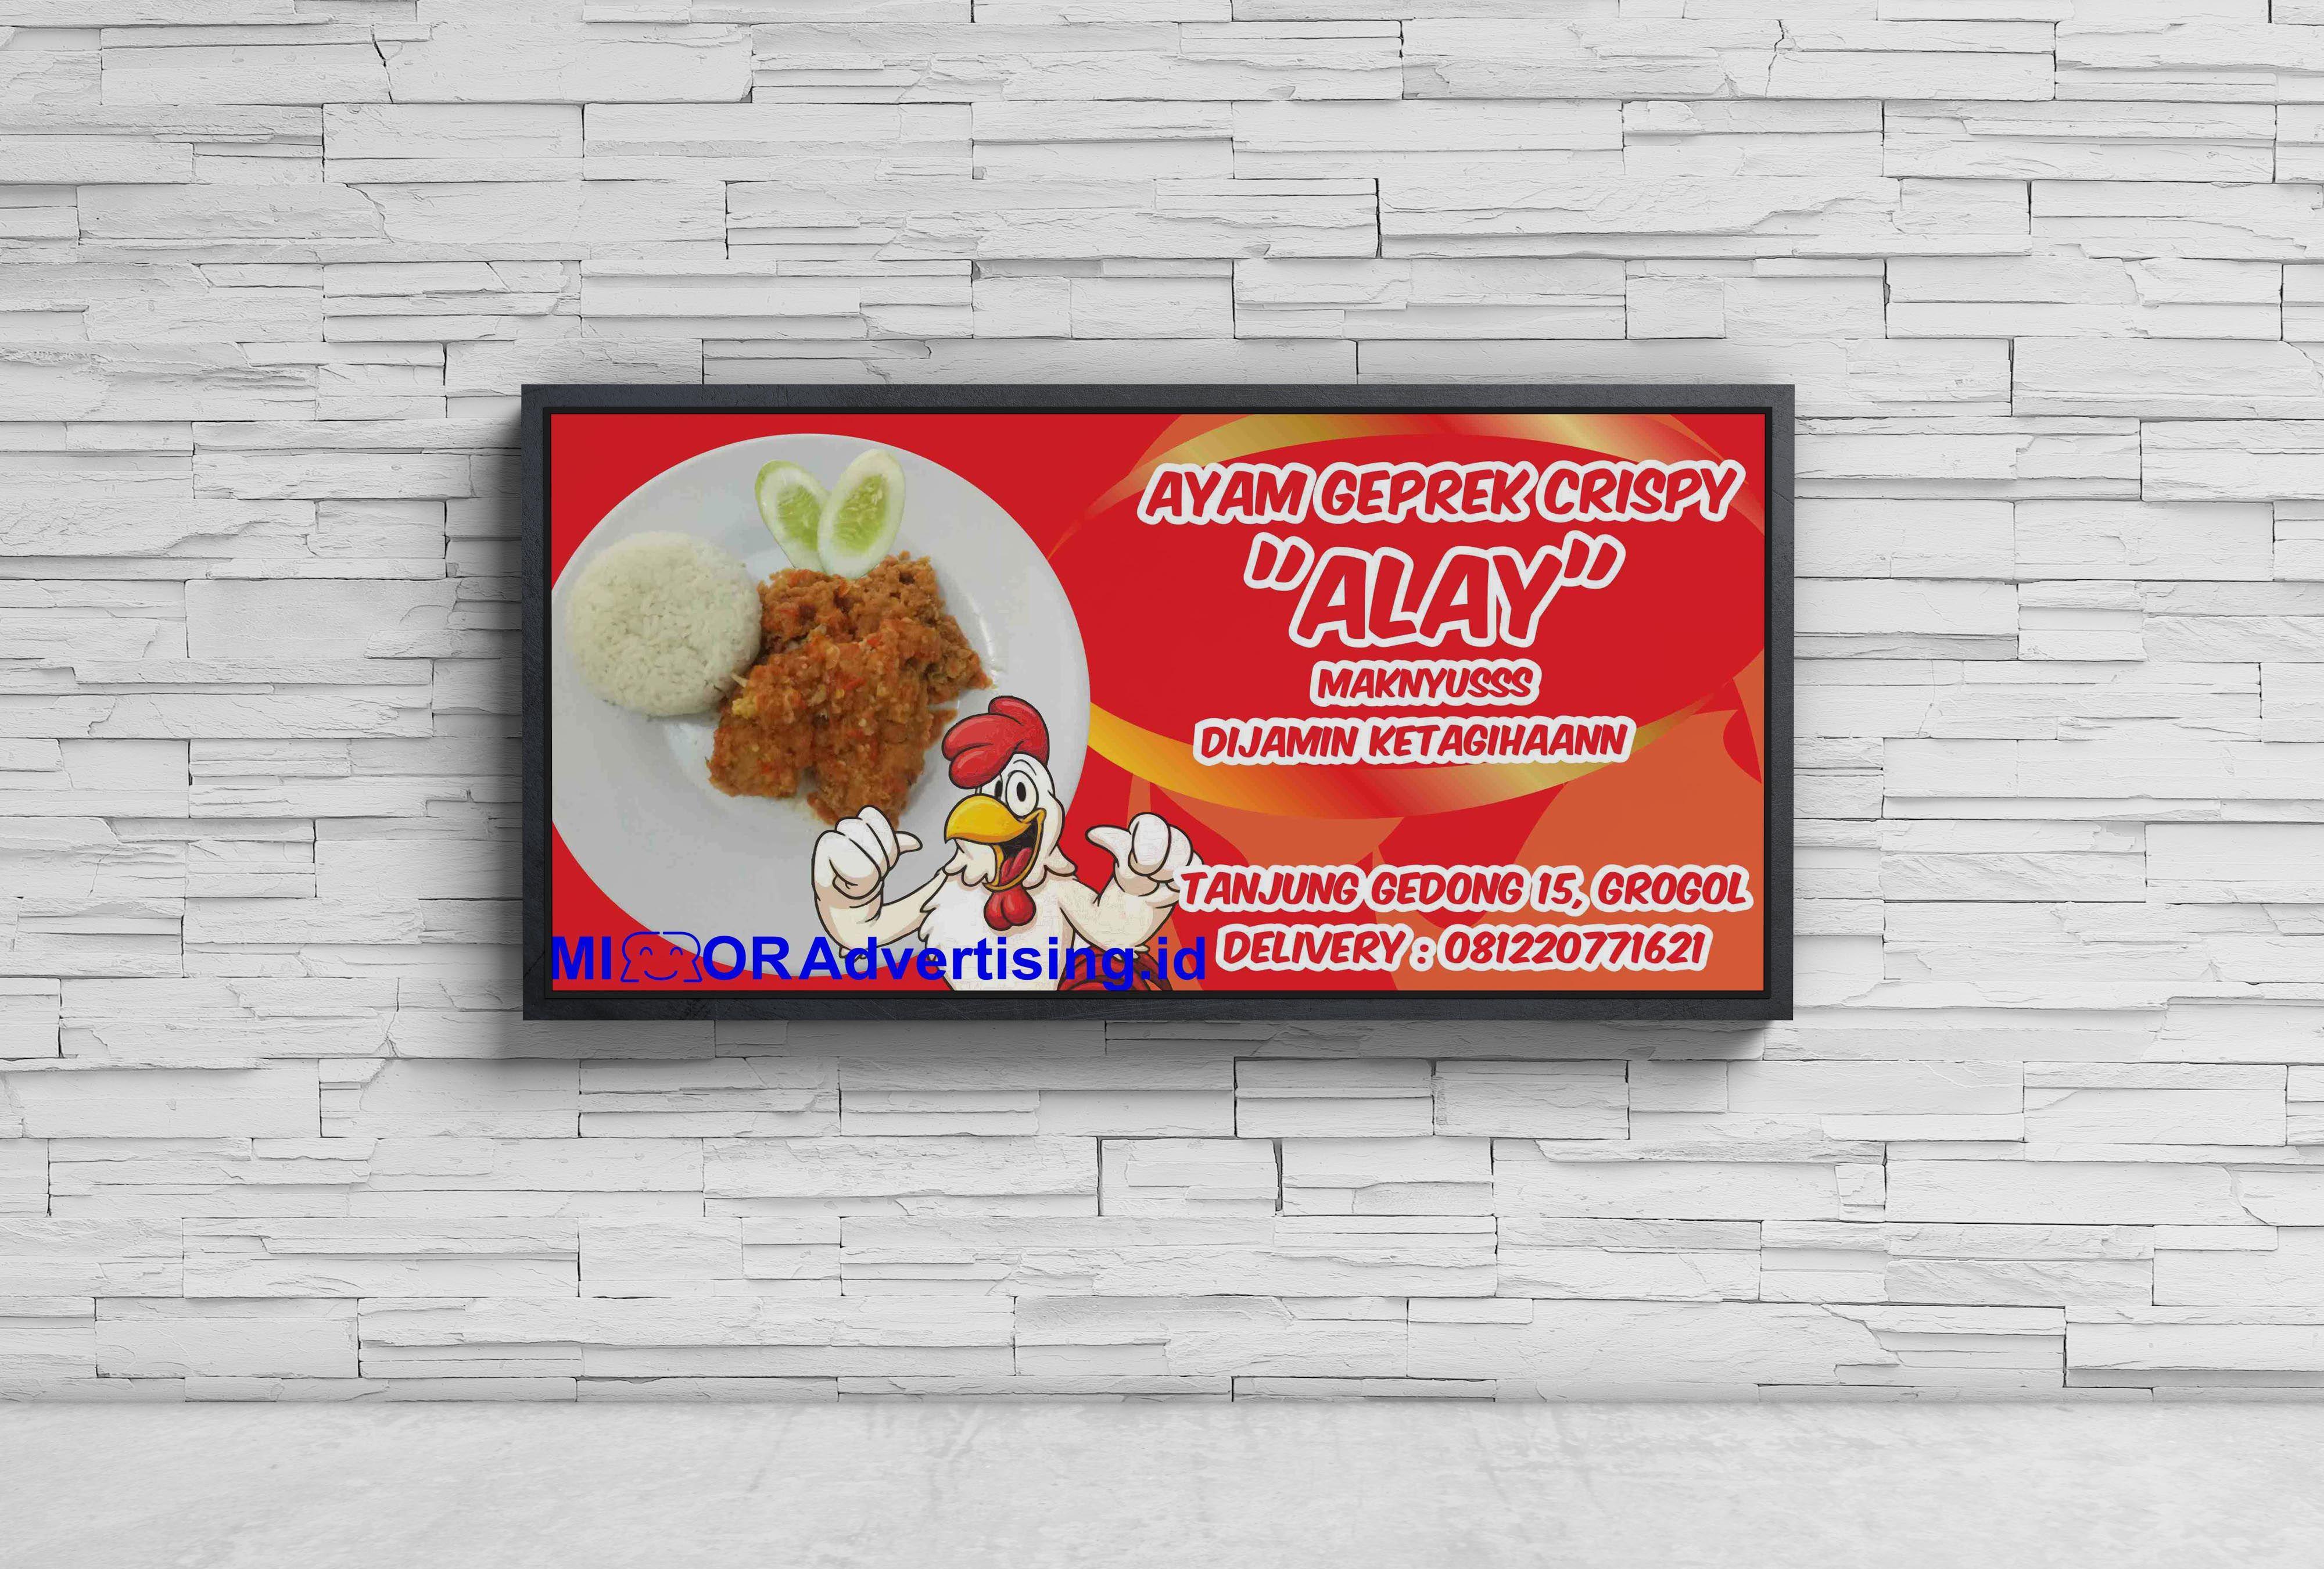 Contoh Spanduk Ayam Geprek - gambar spanduk